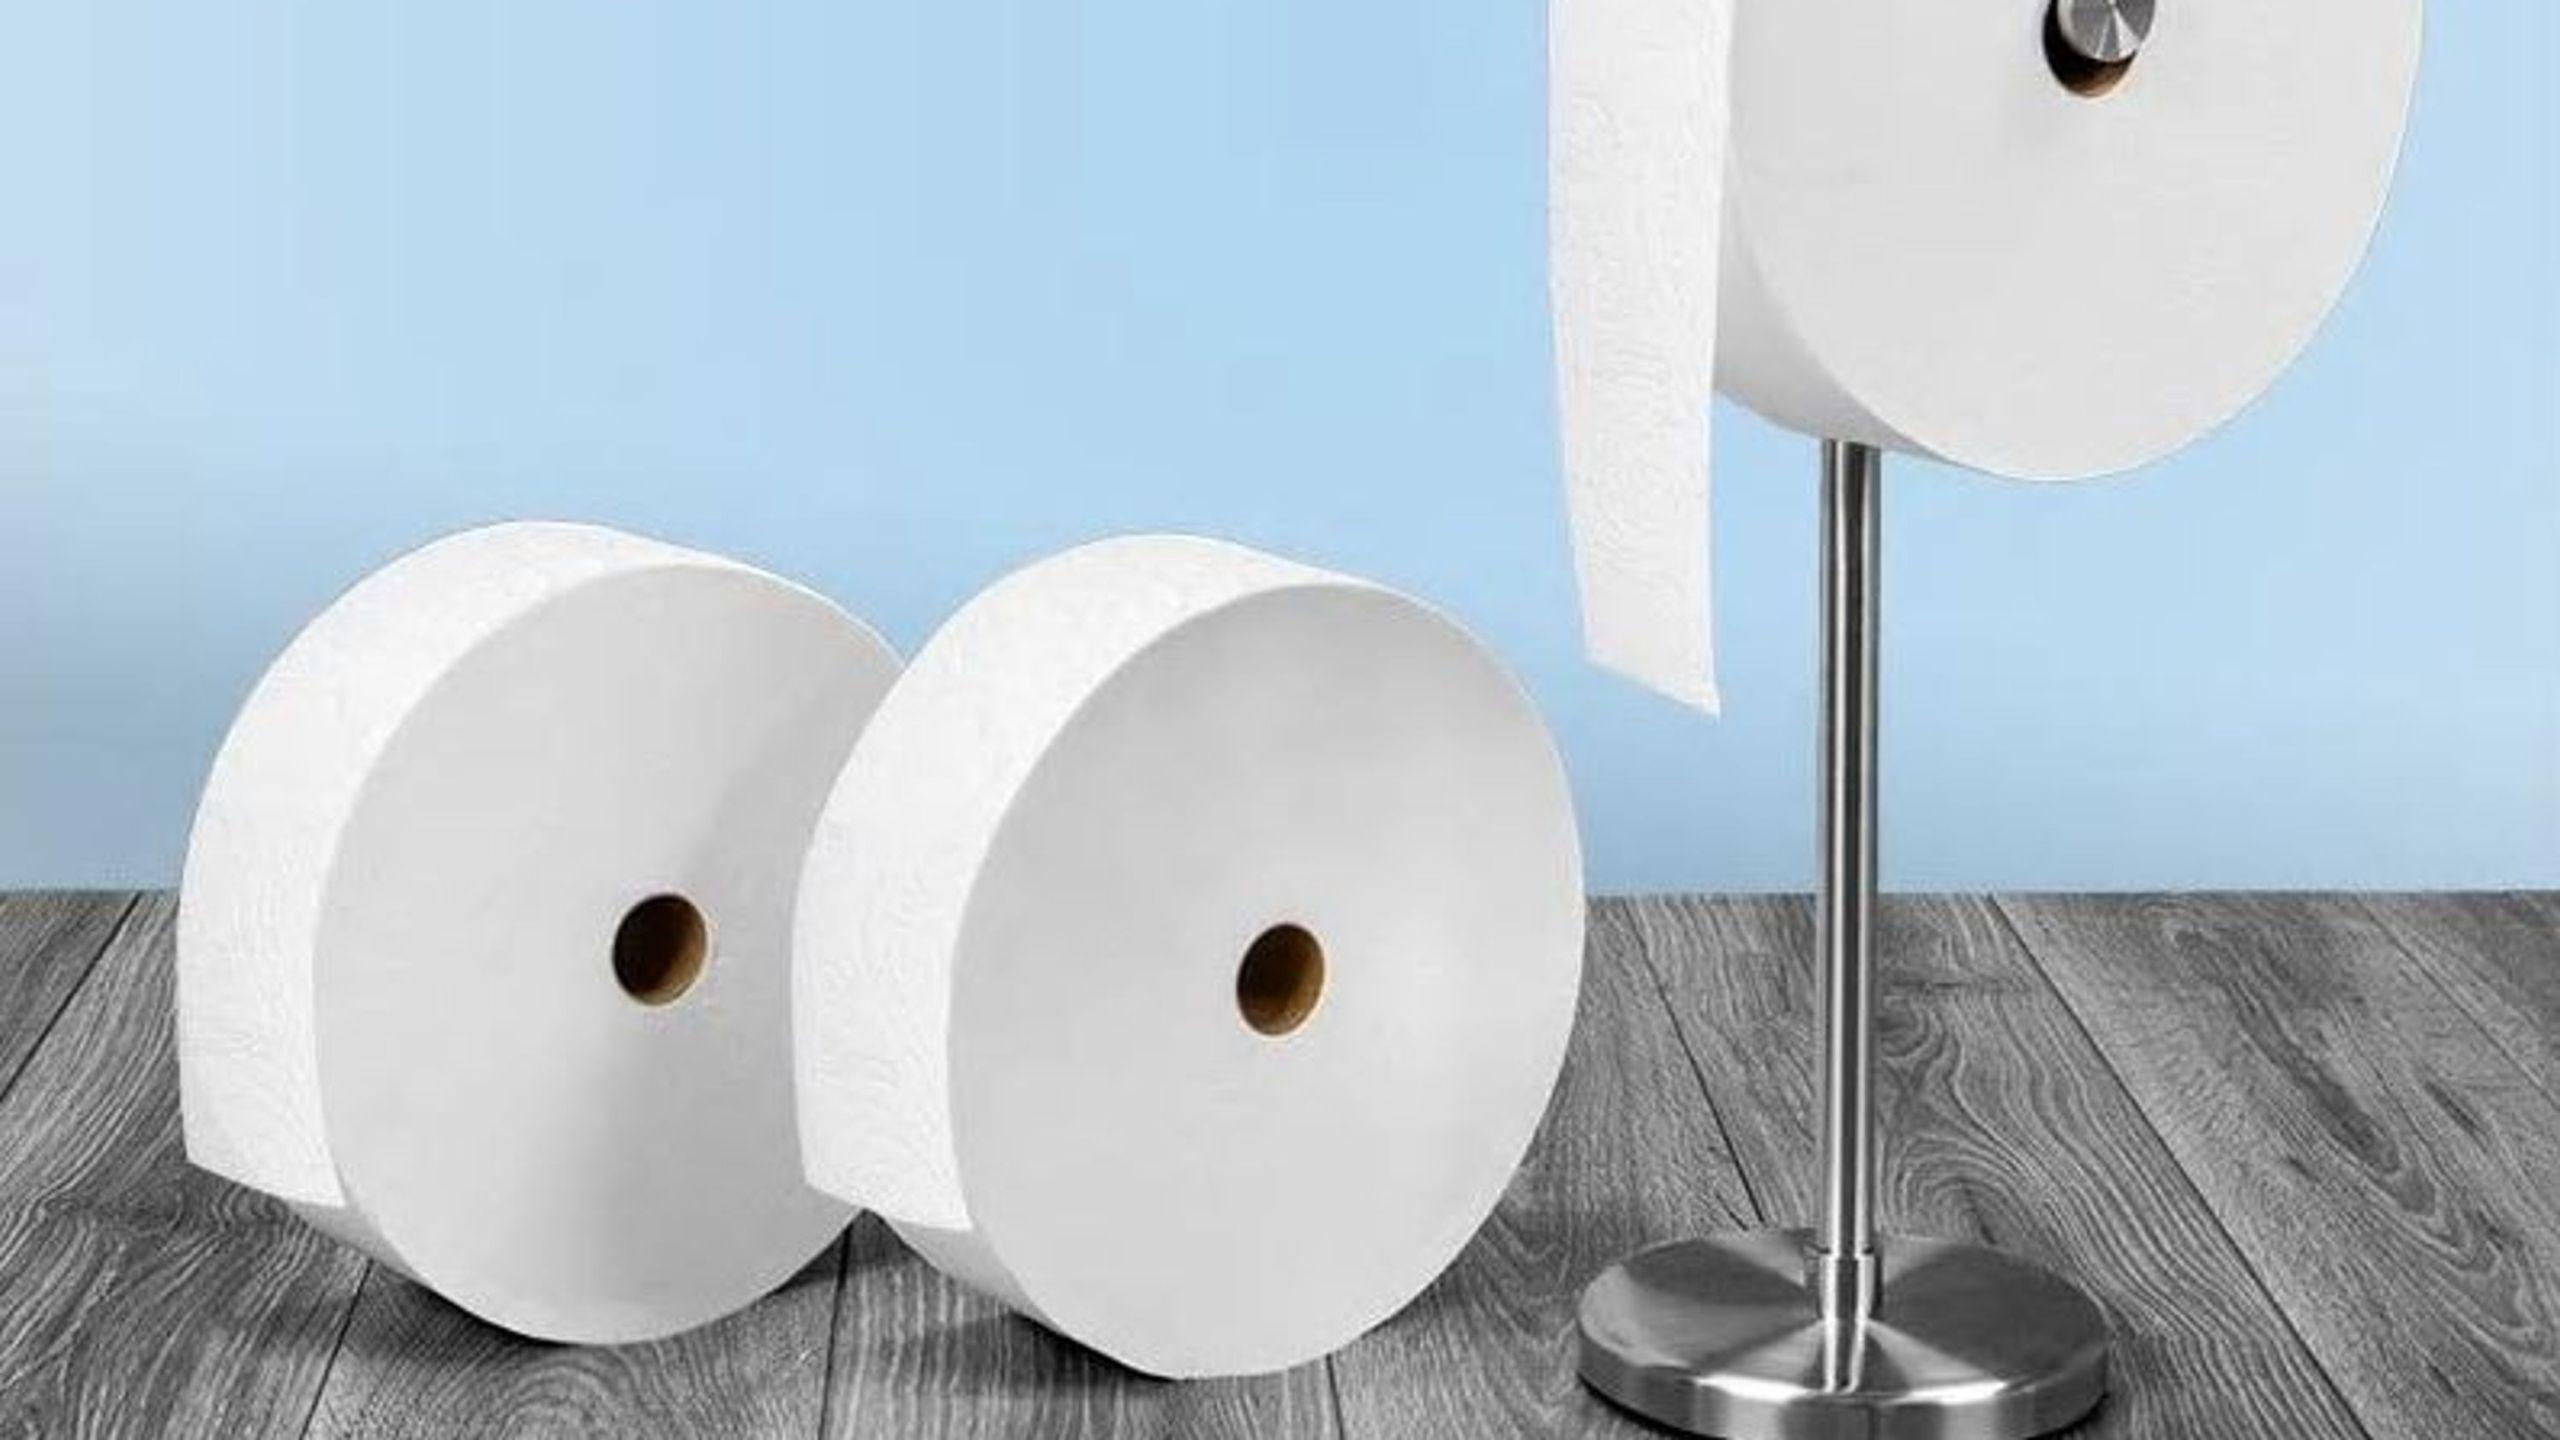 ccda030b-6881-408e-bdbe-7c17a803cd42-toilet_paper_stand_1554334776565.jfif.jpg